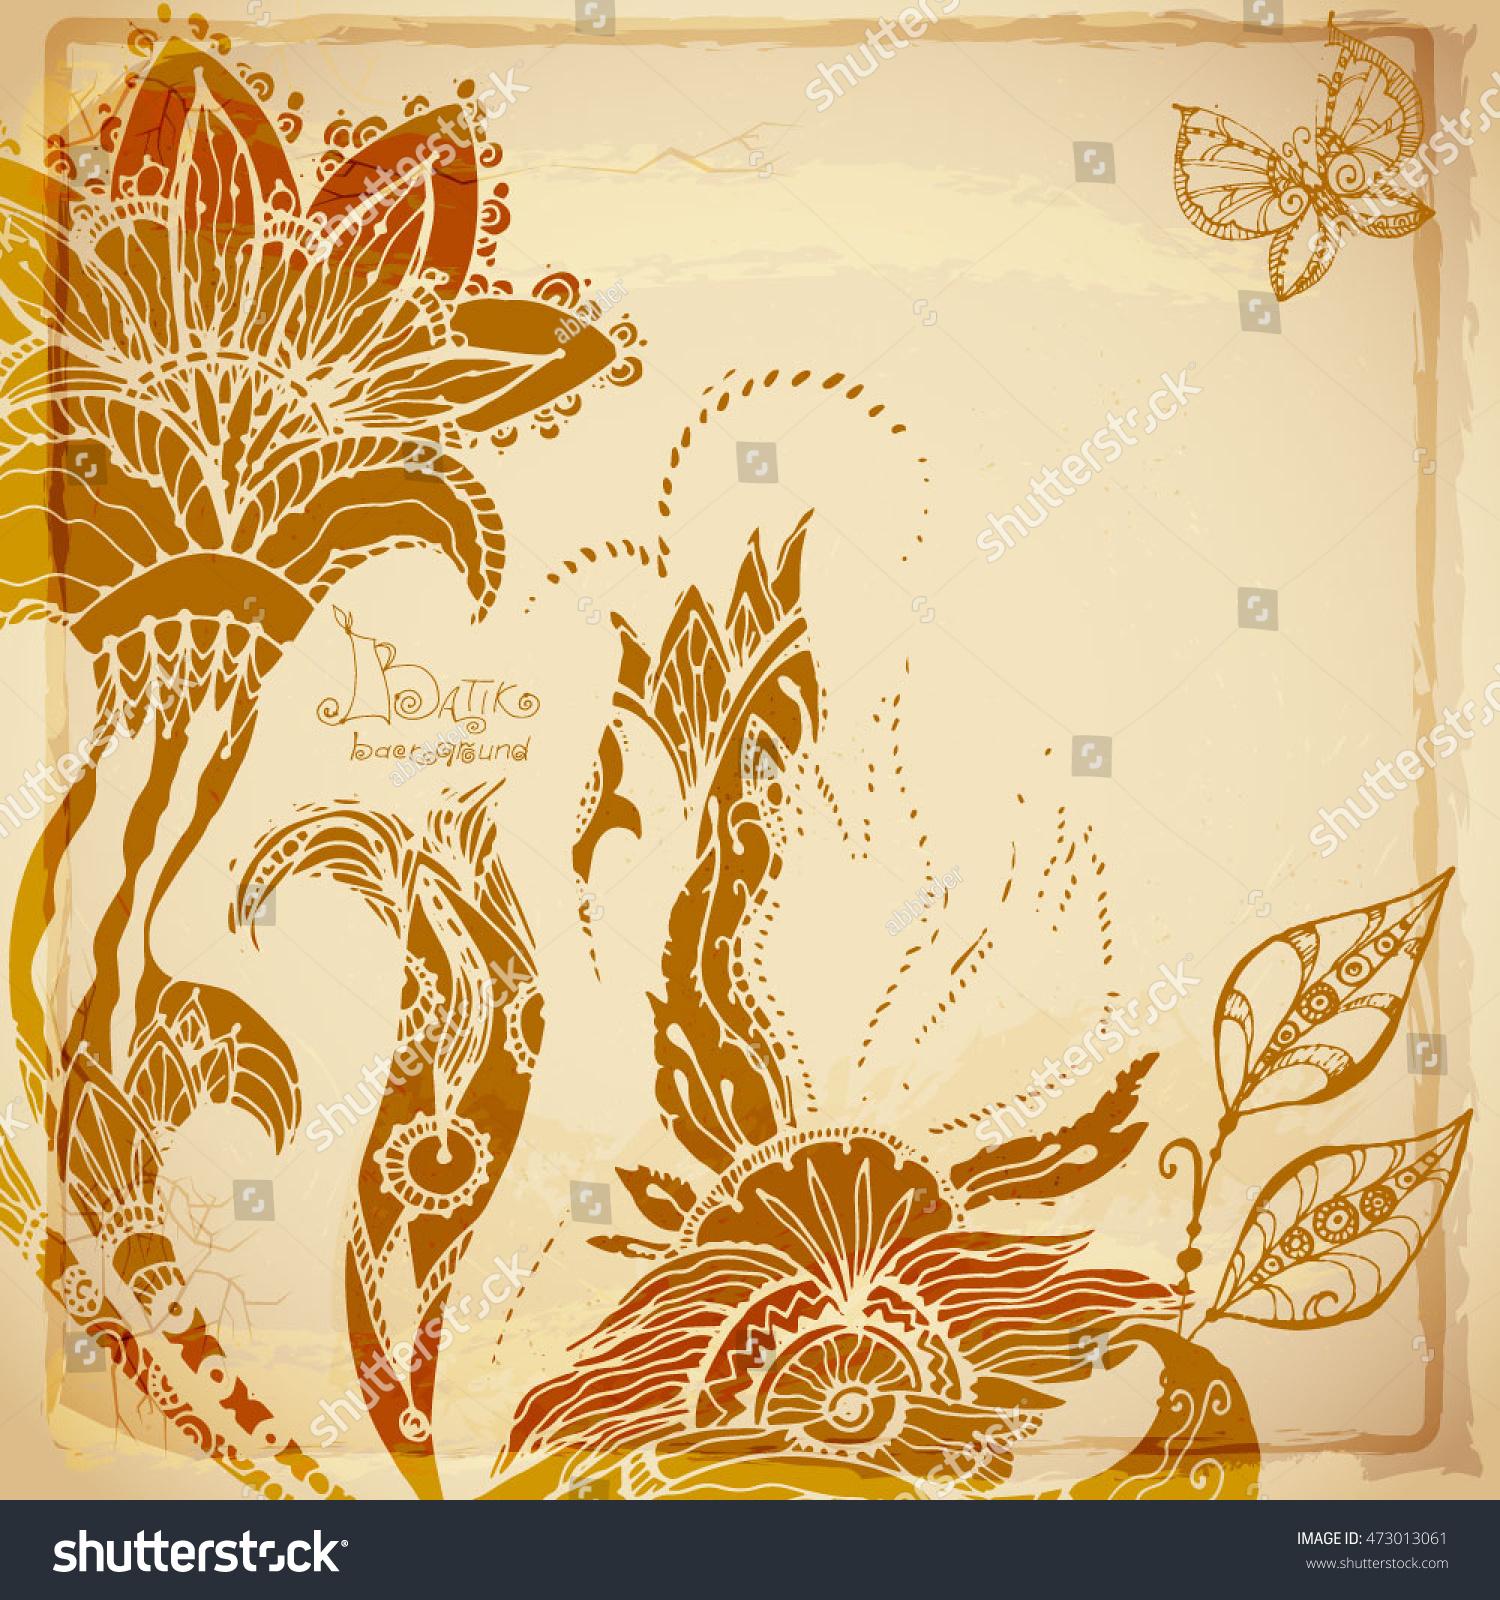 Gambar Vintage Wallpapers Background Hd Wallpaper Gambar